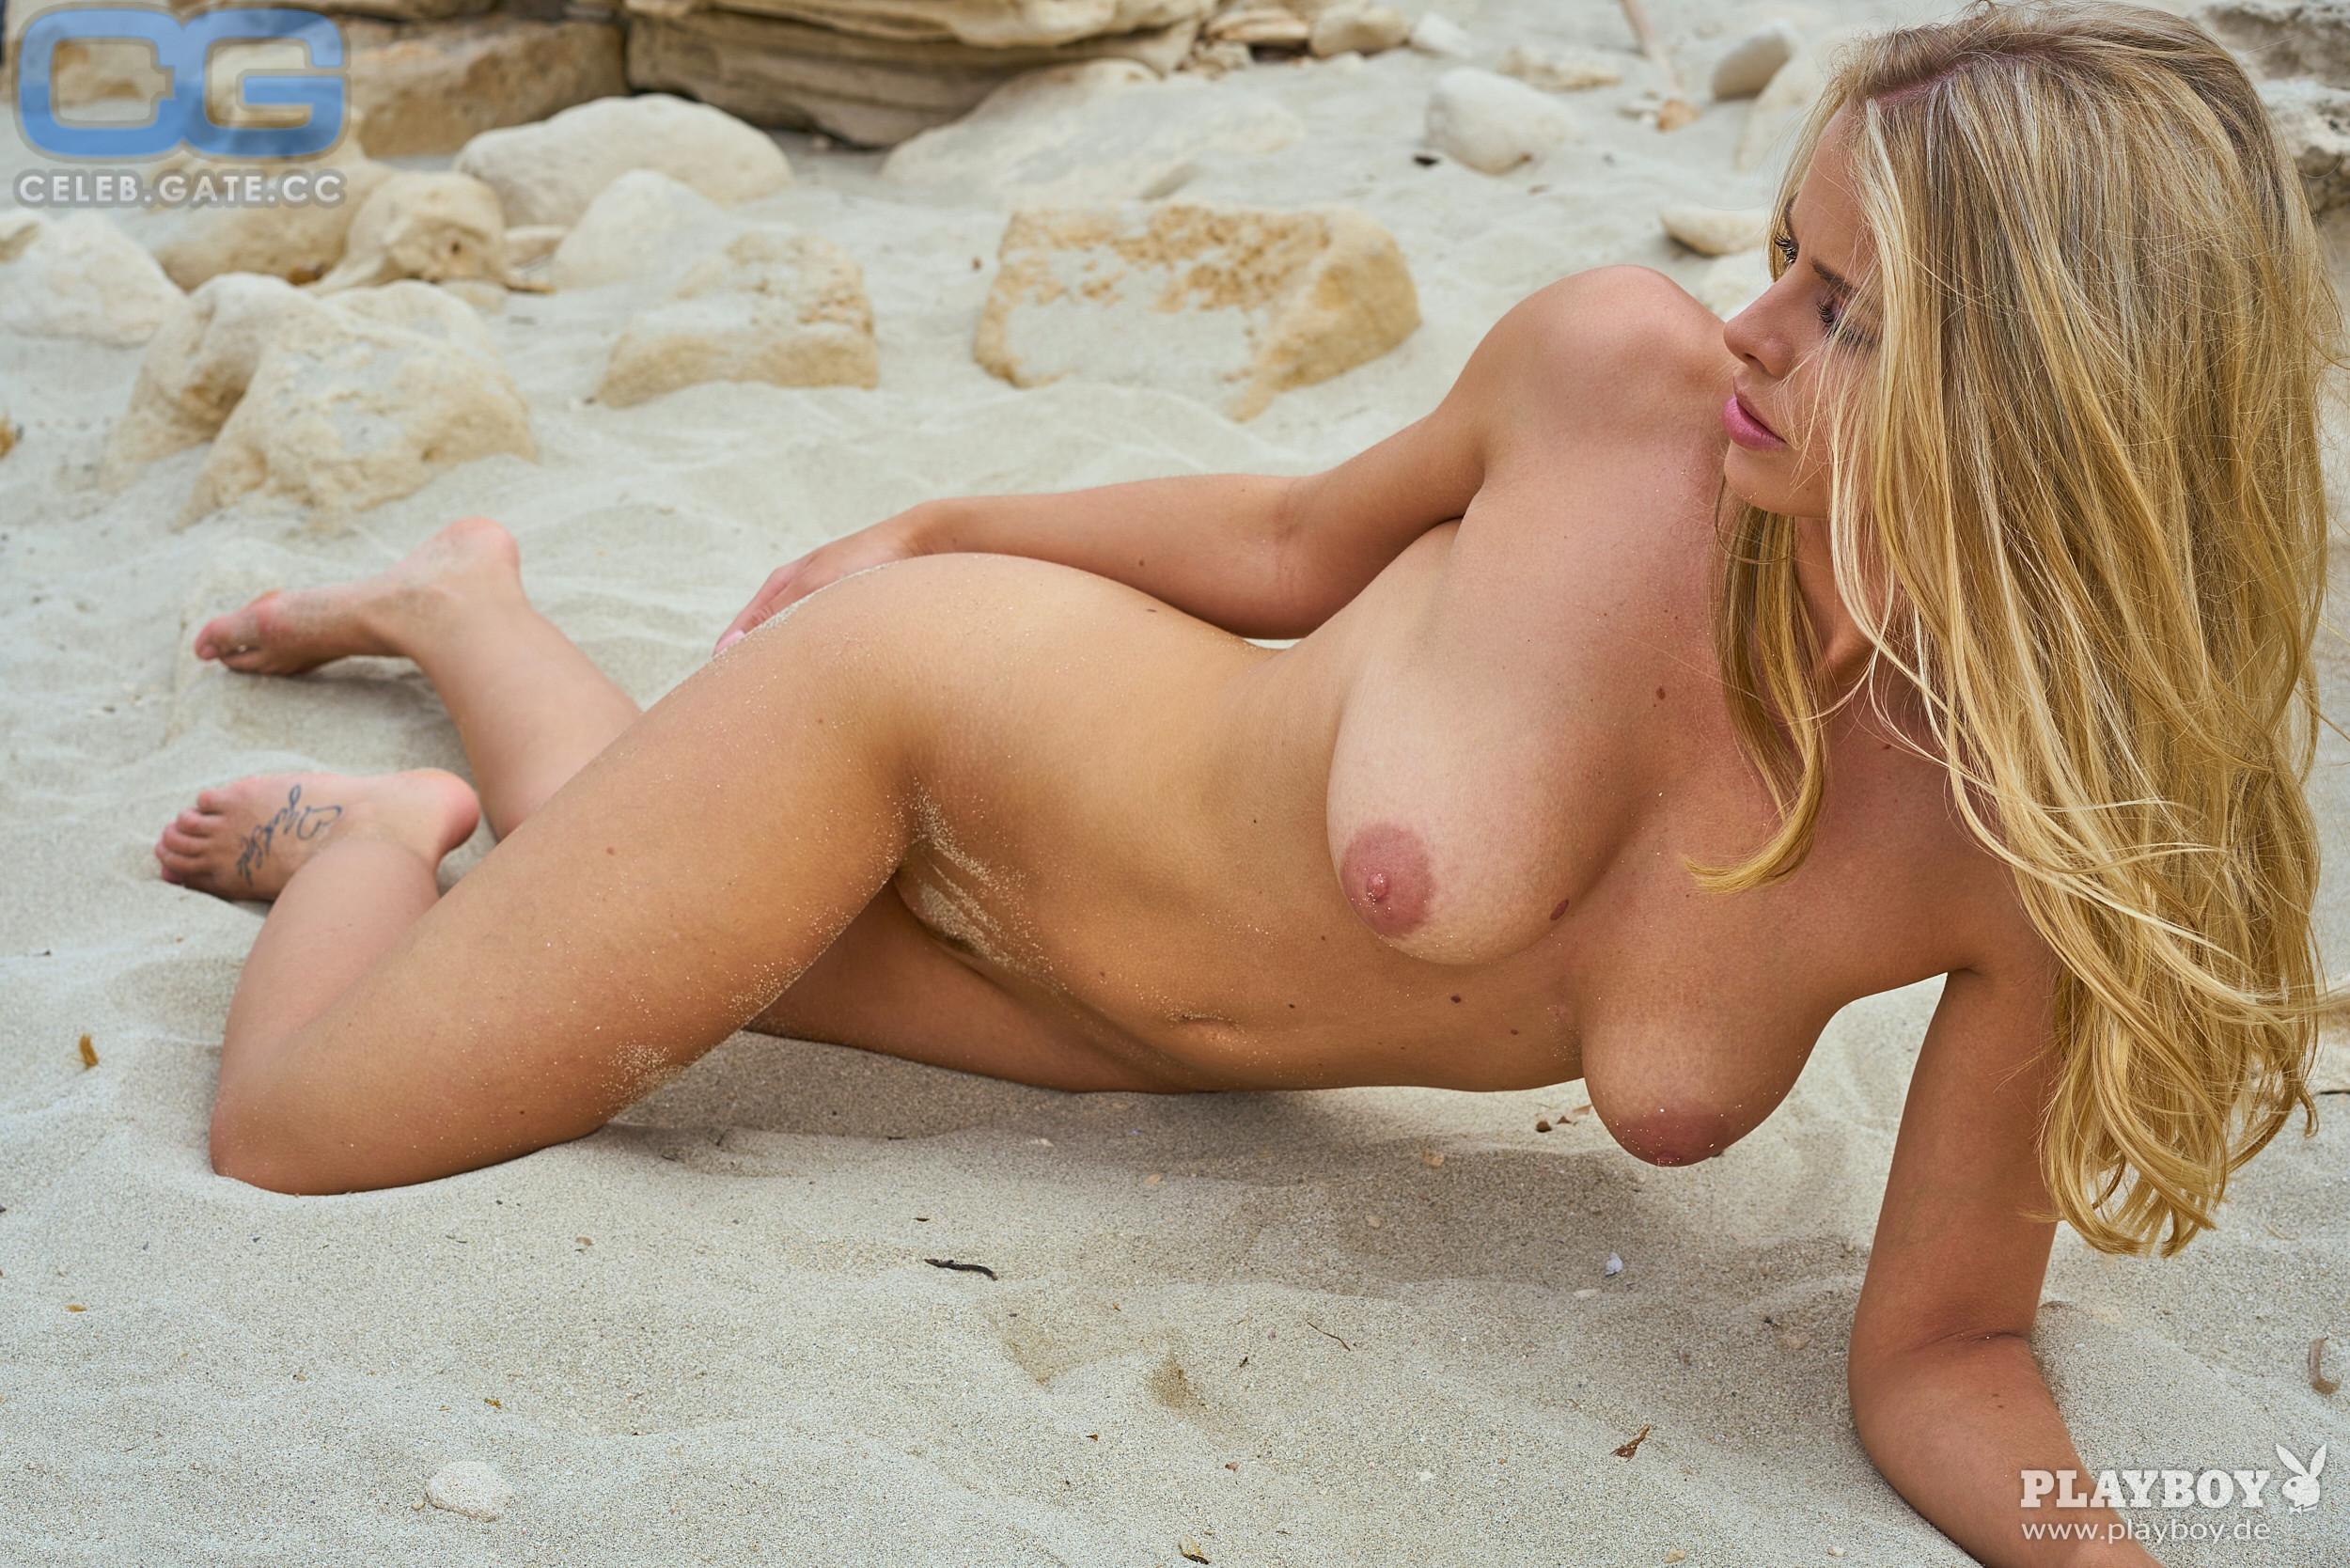 Saskia valencia nude hot naked babes nude picture